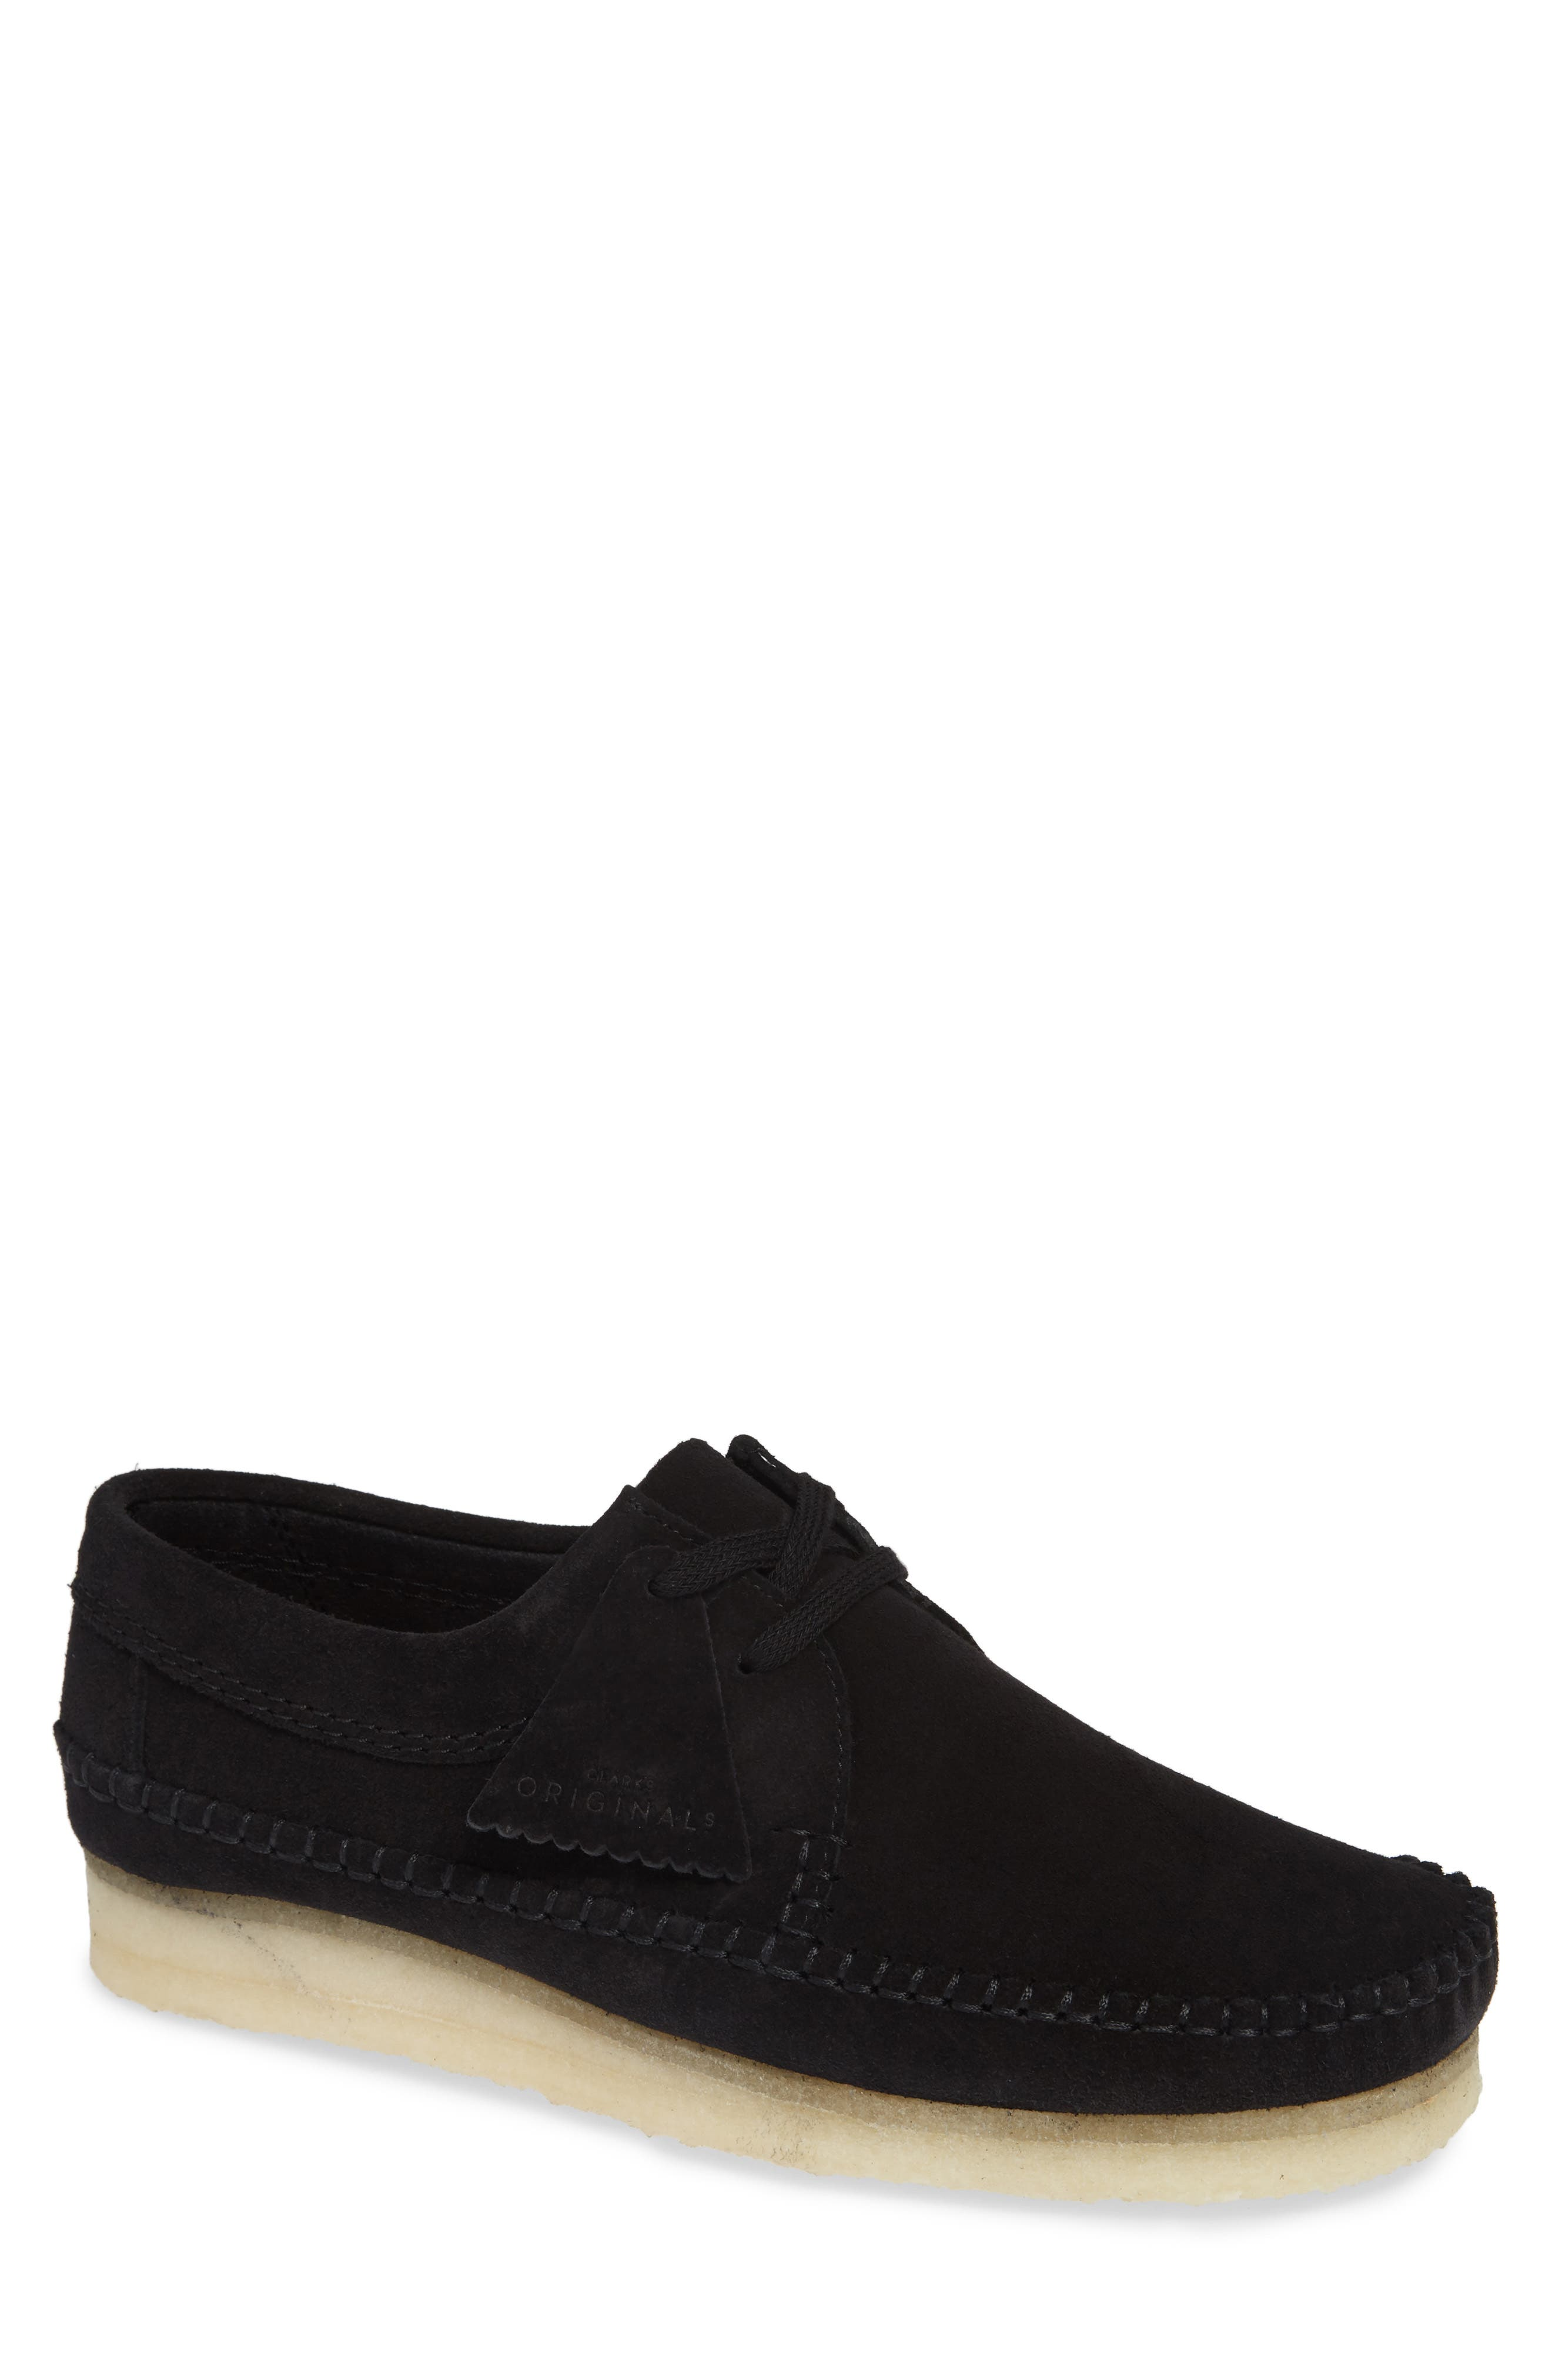 'Weaver' Moc Toe Derby,                         Main,                         color, BLACK SUEDE